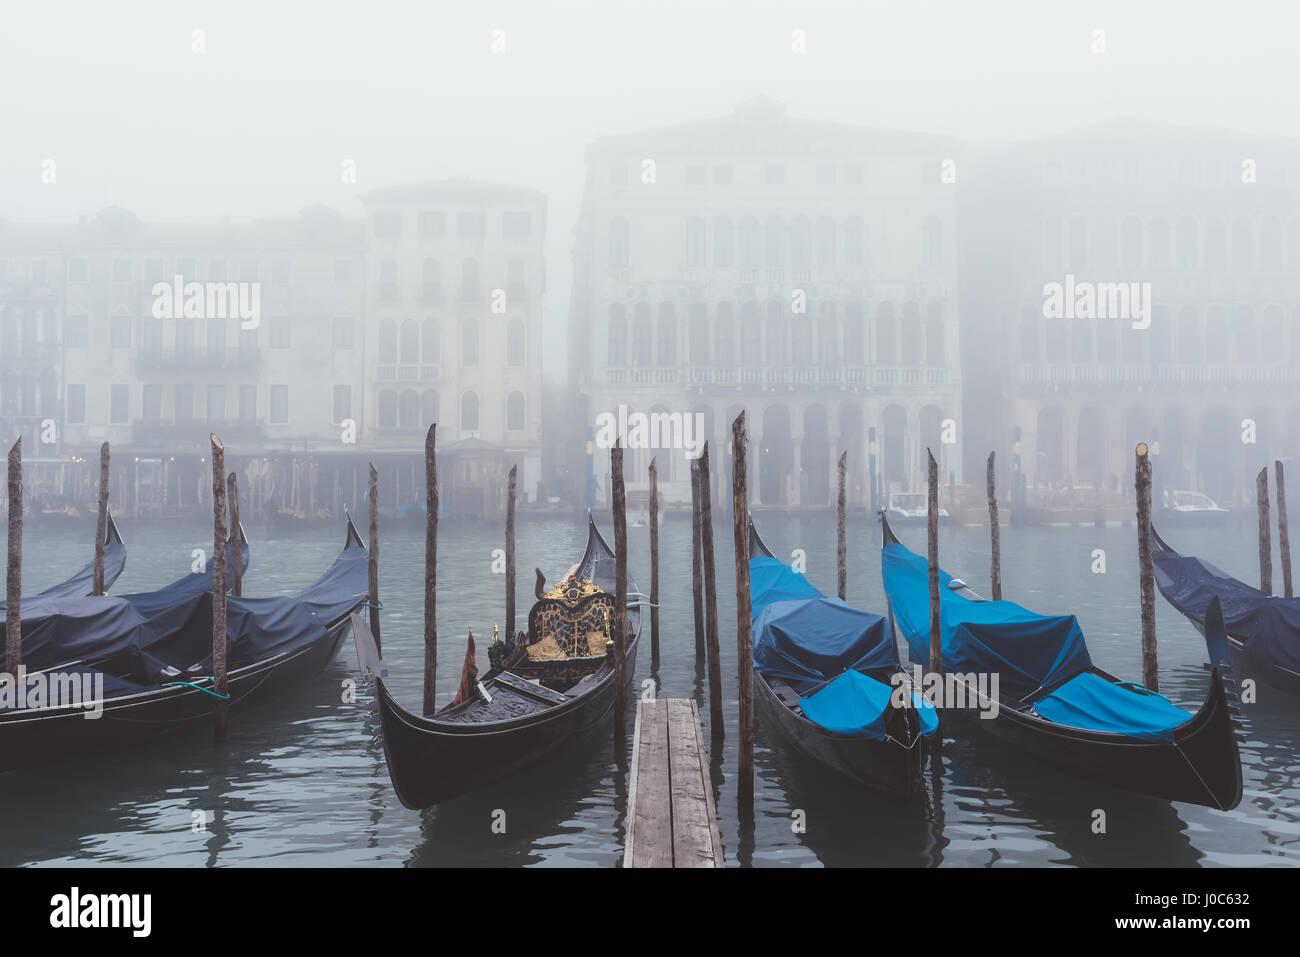 Rows of gondolas on misty canal, Venice, Italy - Stock Image